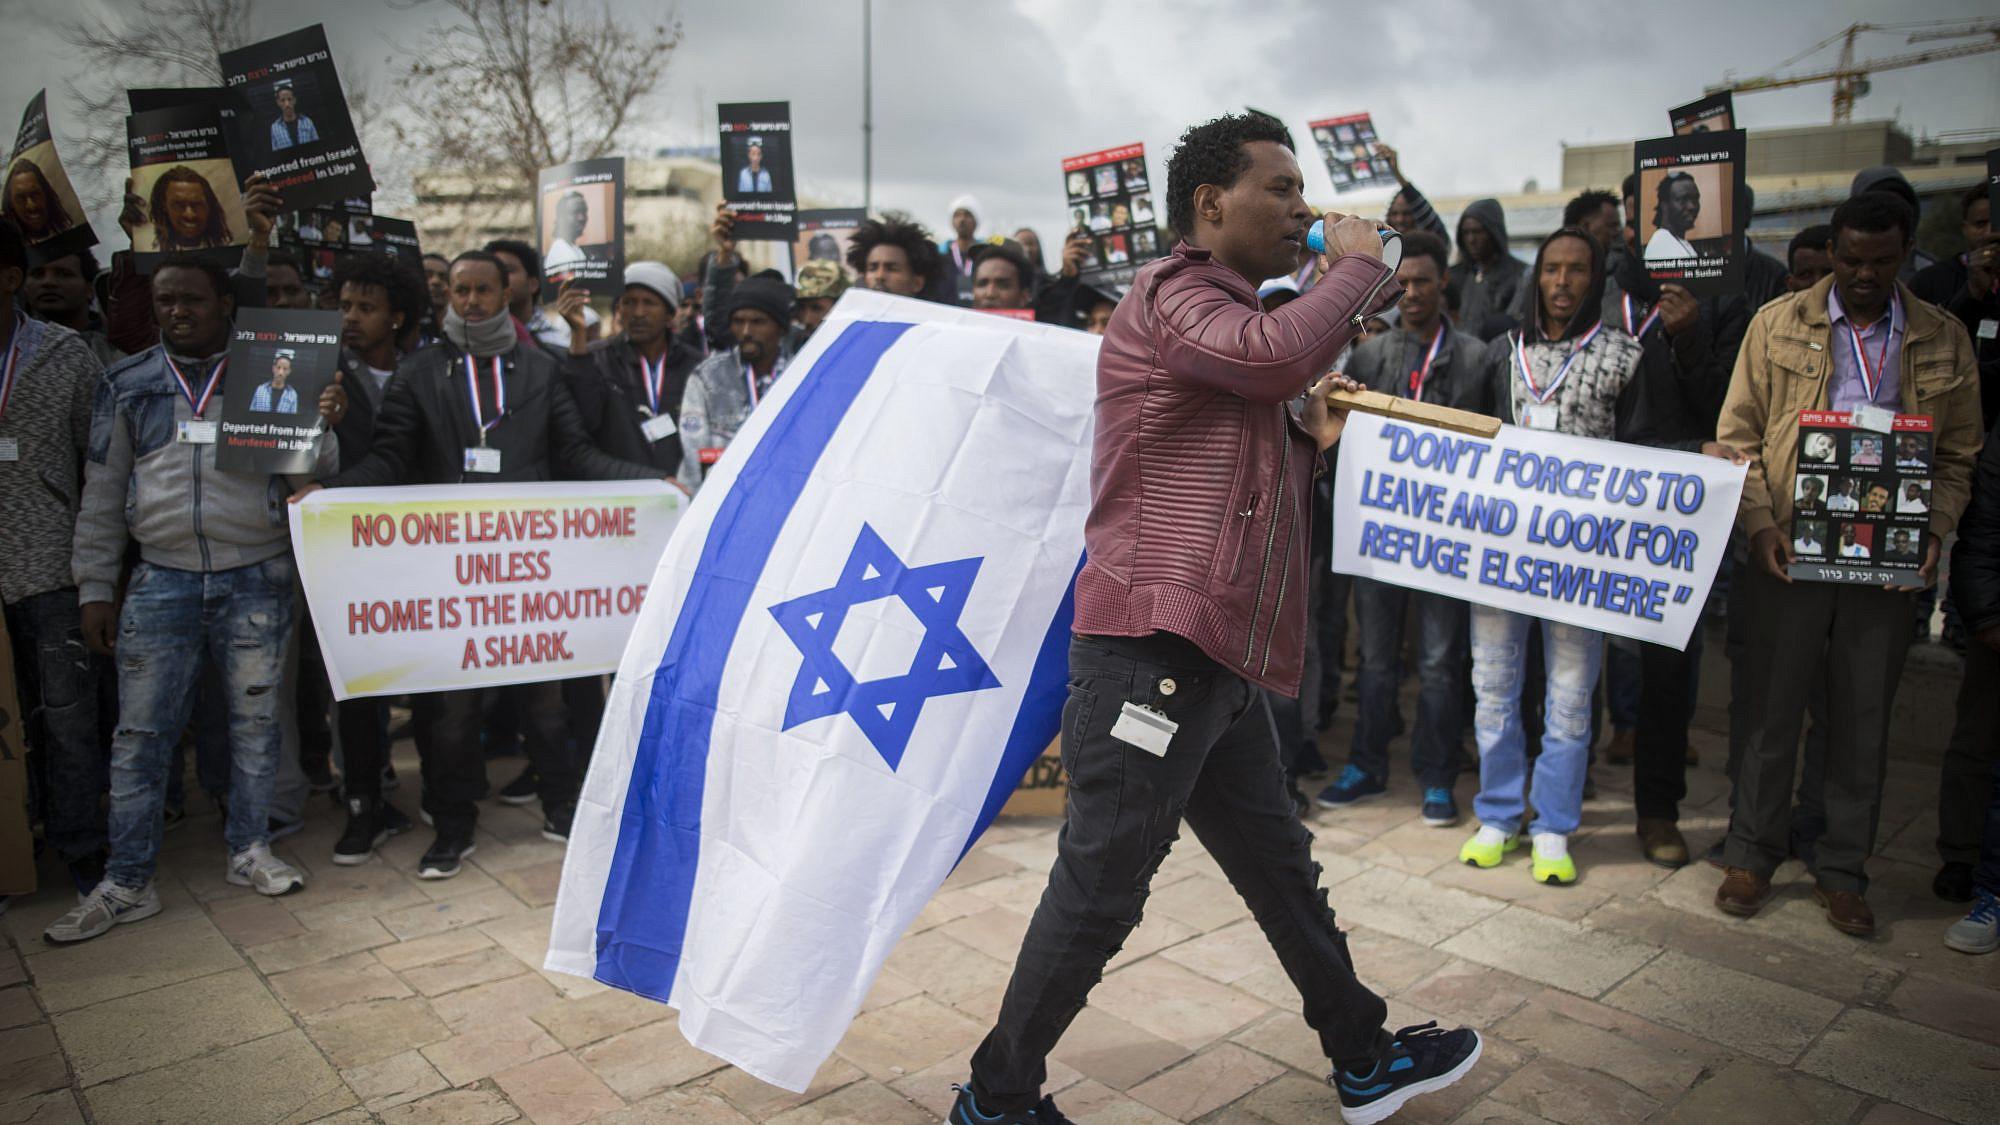 African migrants gather during a protest outside the Supreme Court in Jerusalem on Jan. 26, 2017. Credit: Yonatan Sindel/Flash90